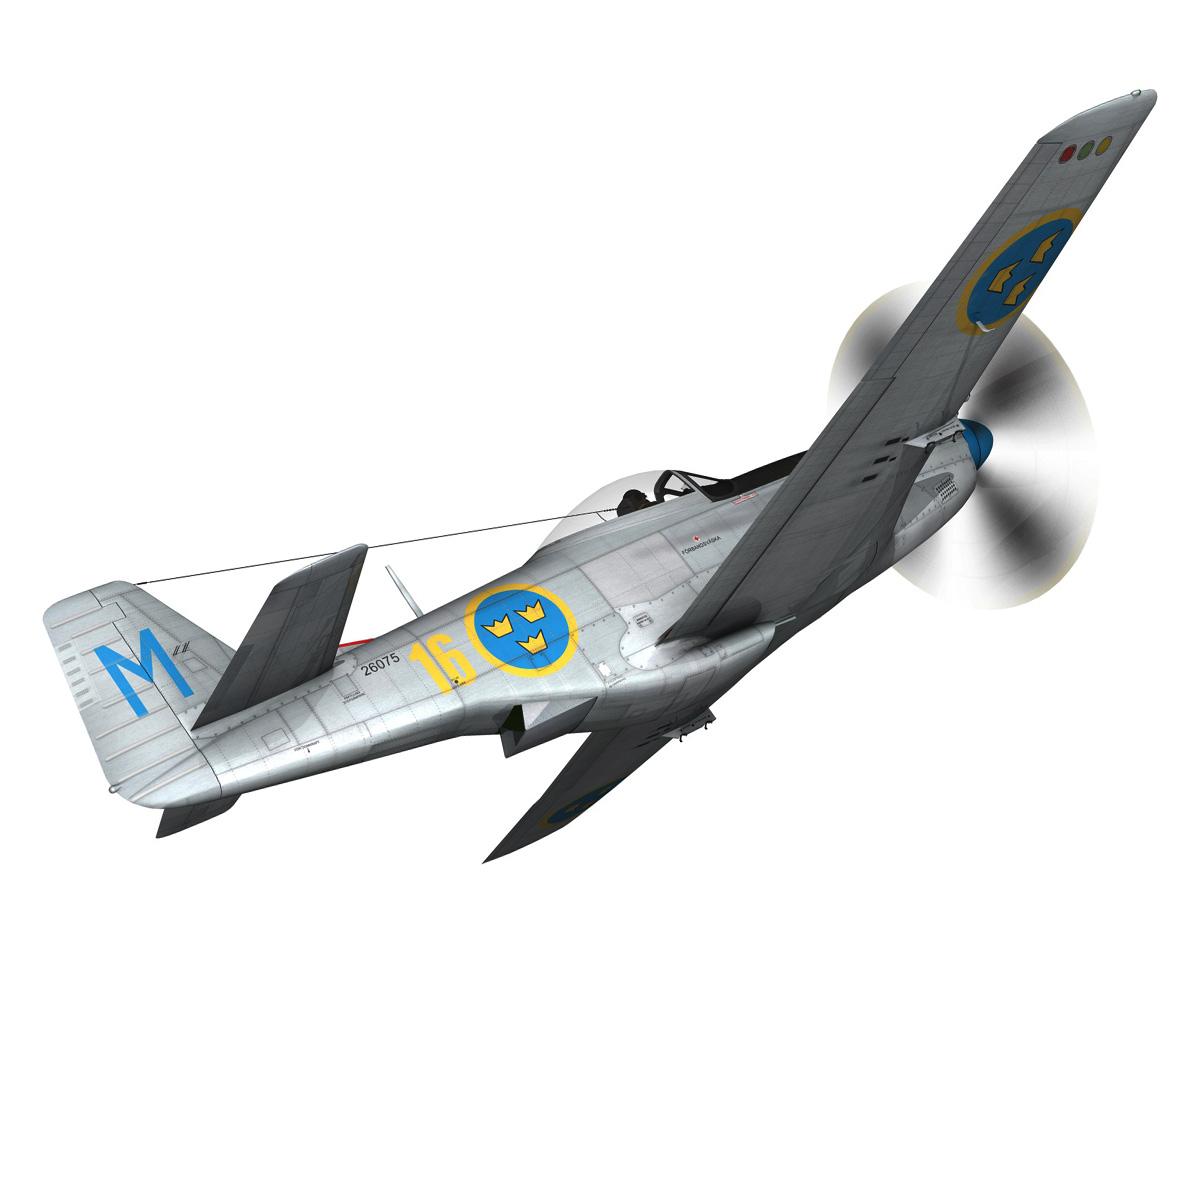 north american p-51d mustang – swedisch airforce 3d model fbx c4d lwo obj 268231